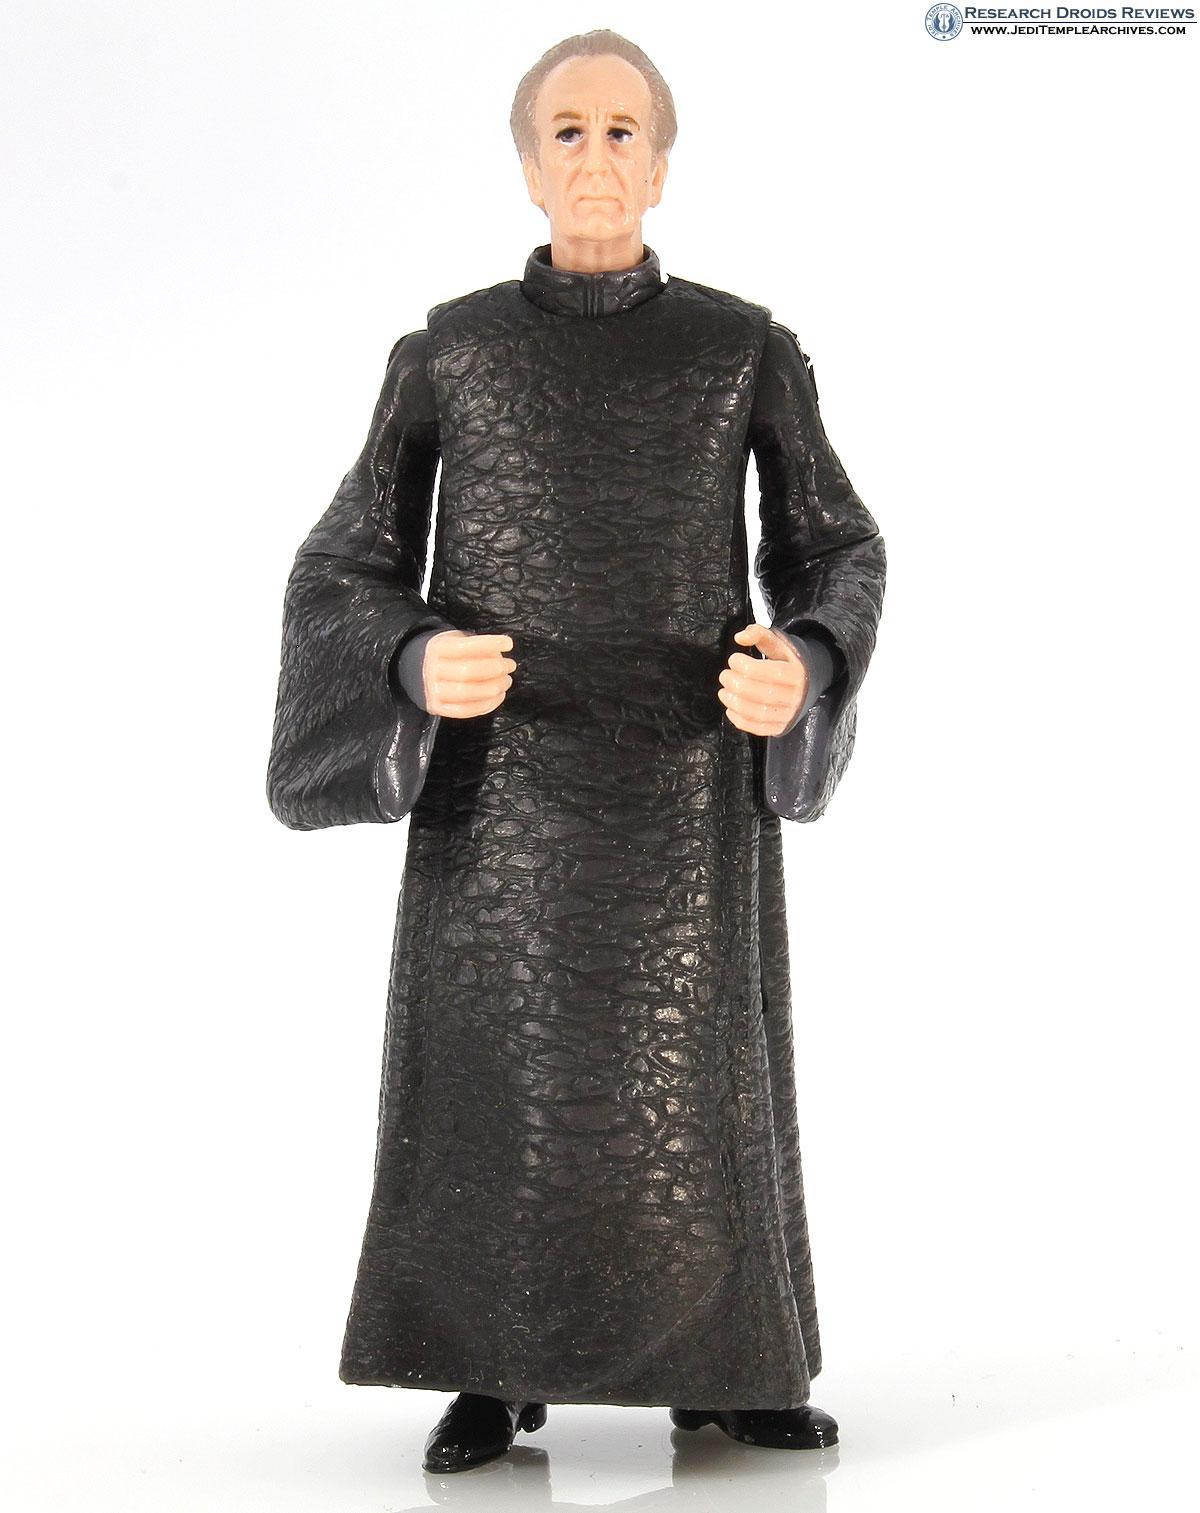 Chancellor Palpatine (Supreme Chancellor)